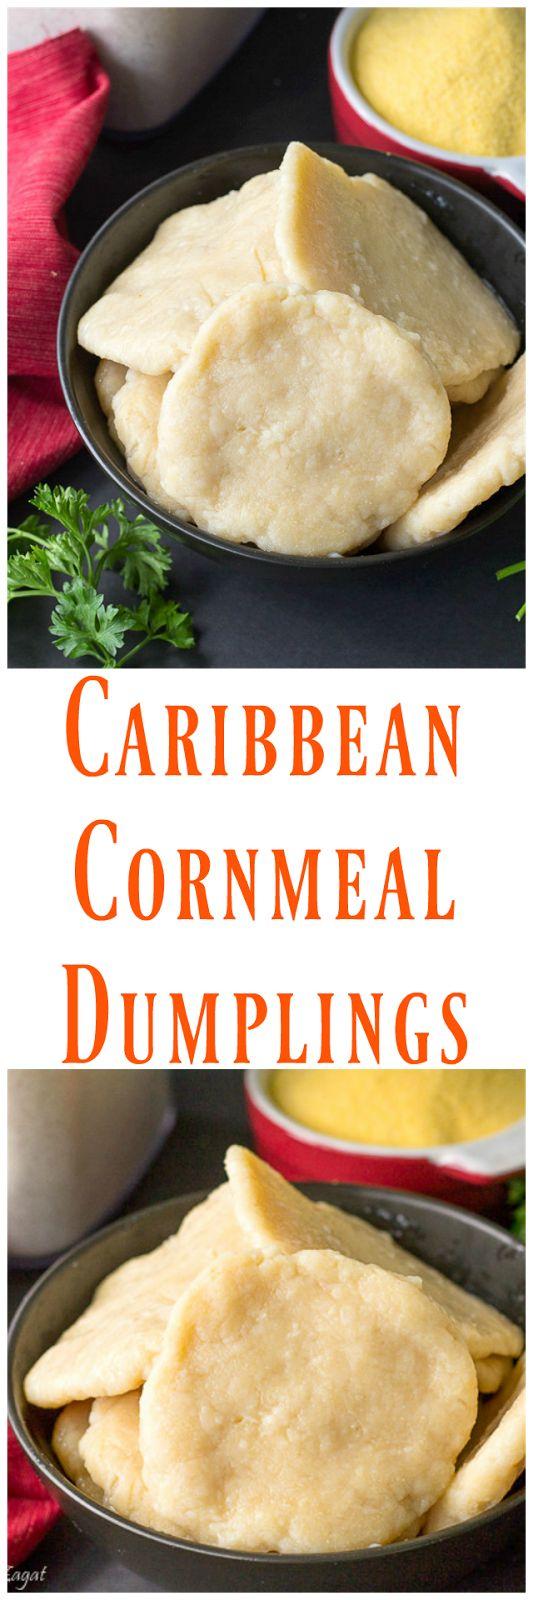 976 best jamaican recipies images on pinterest caribbean food cornmeal dumplings trinidad recipestrinidad foodjamaican forumfinder Gallery